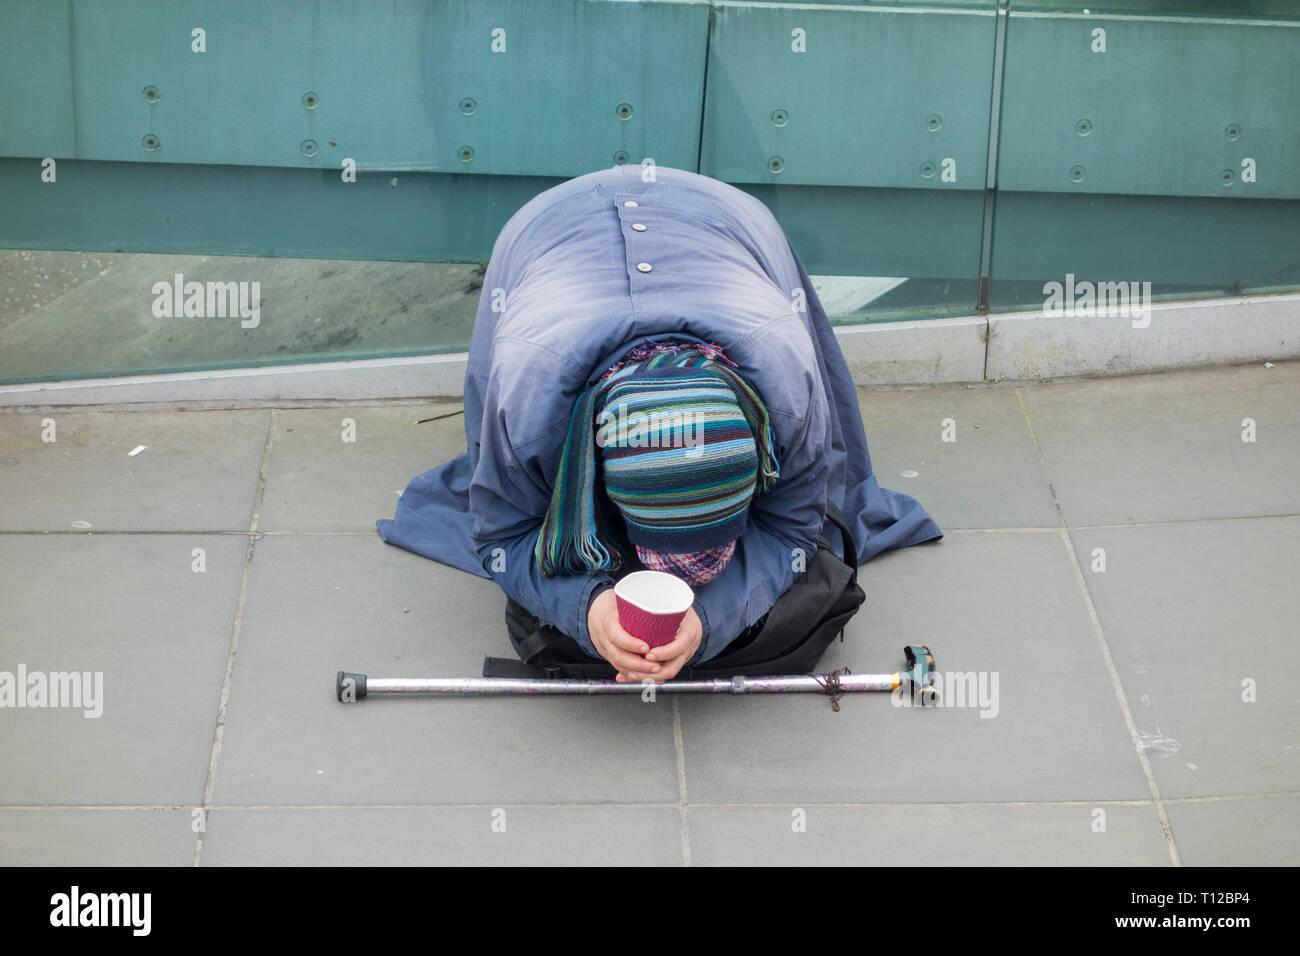 A prostate Eastern European woman begging outside the Tate Modern on the Millenium Bridge, London, UK Stock Photo